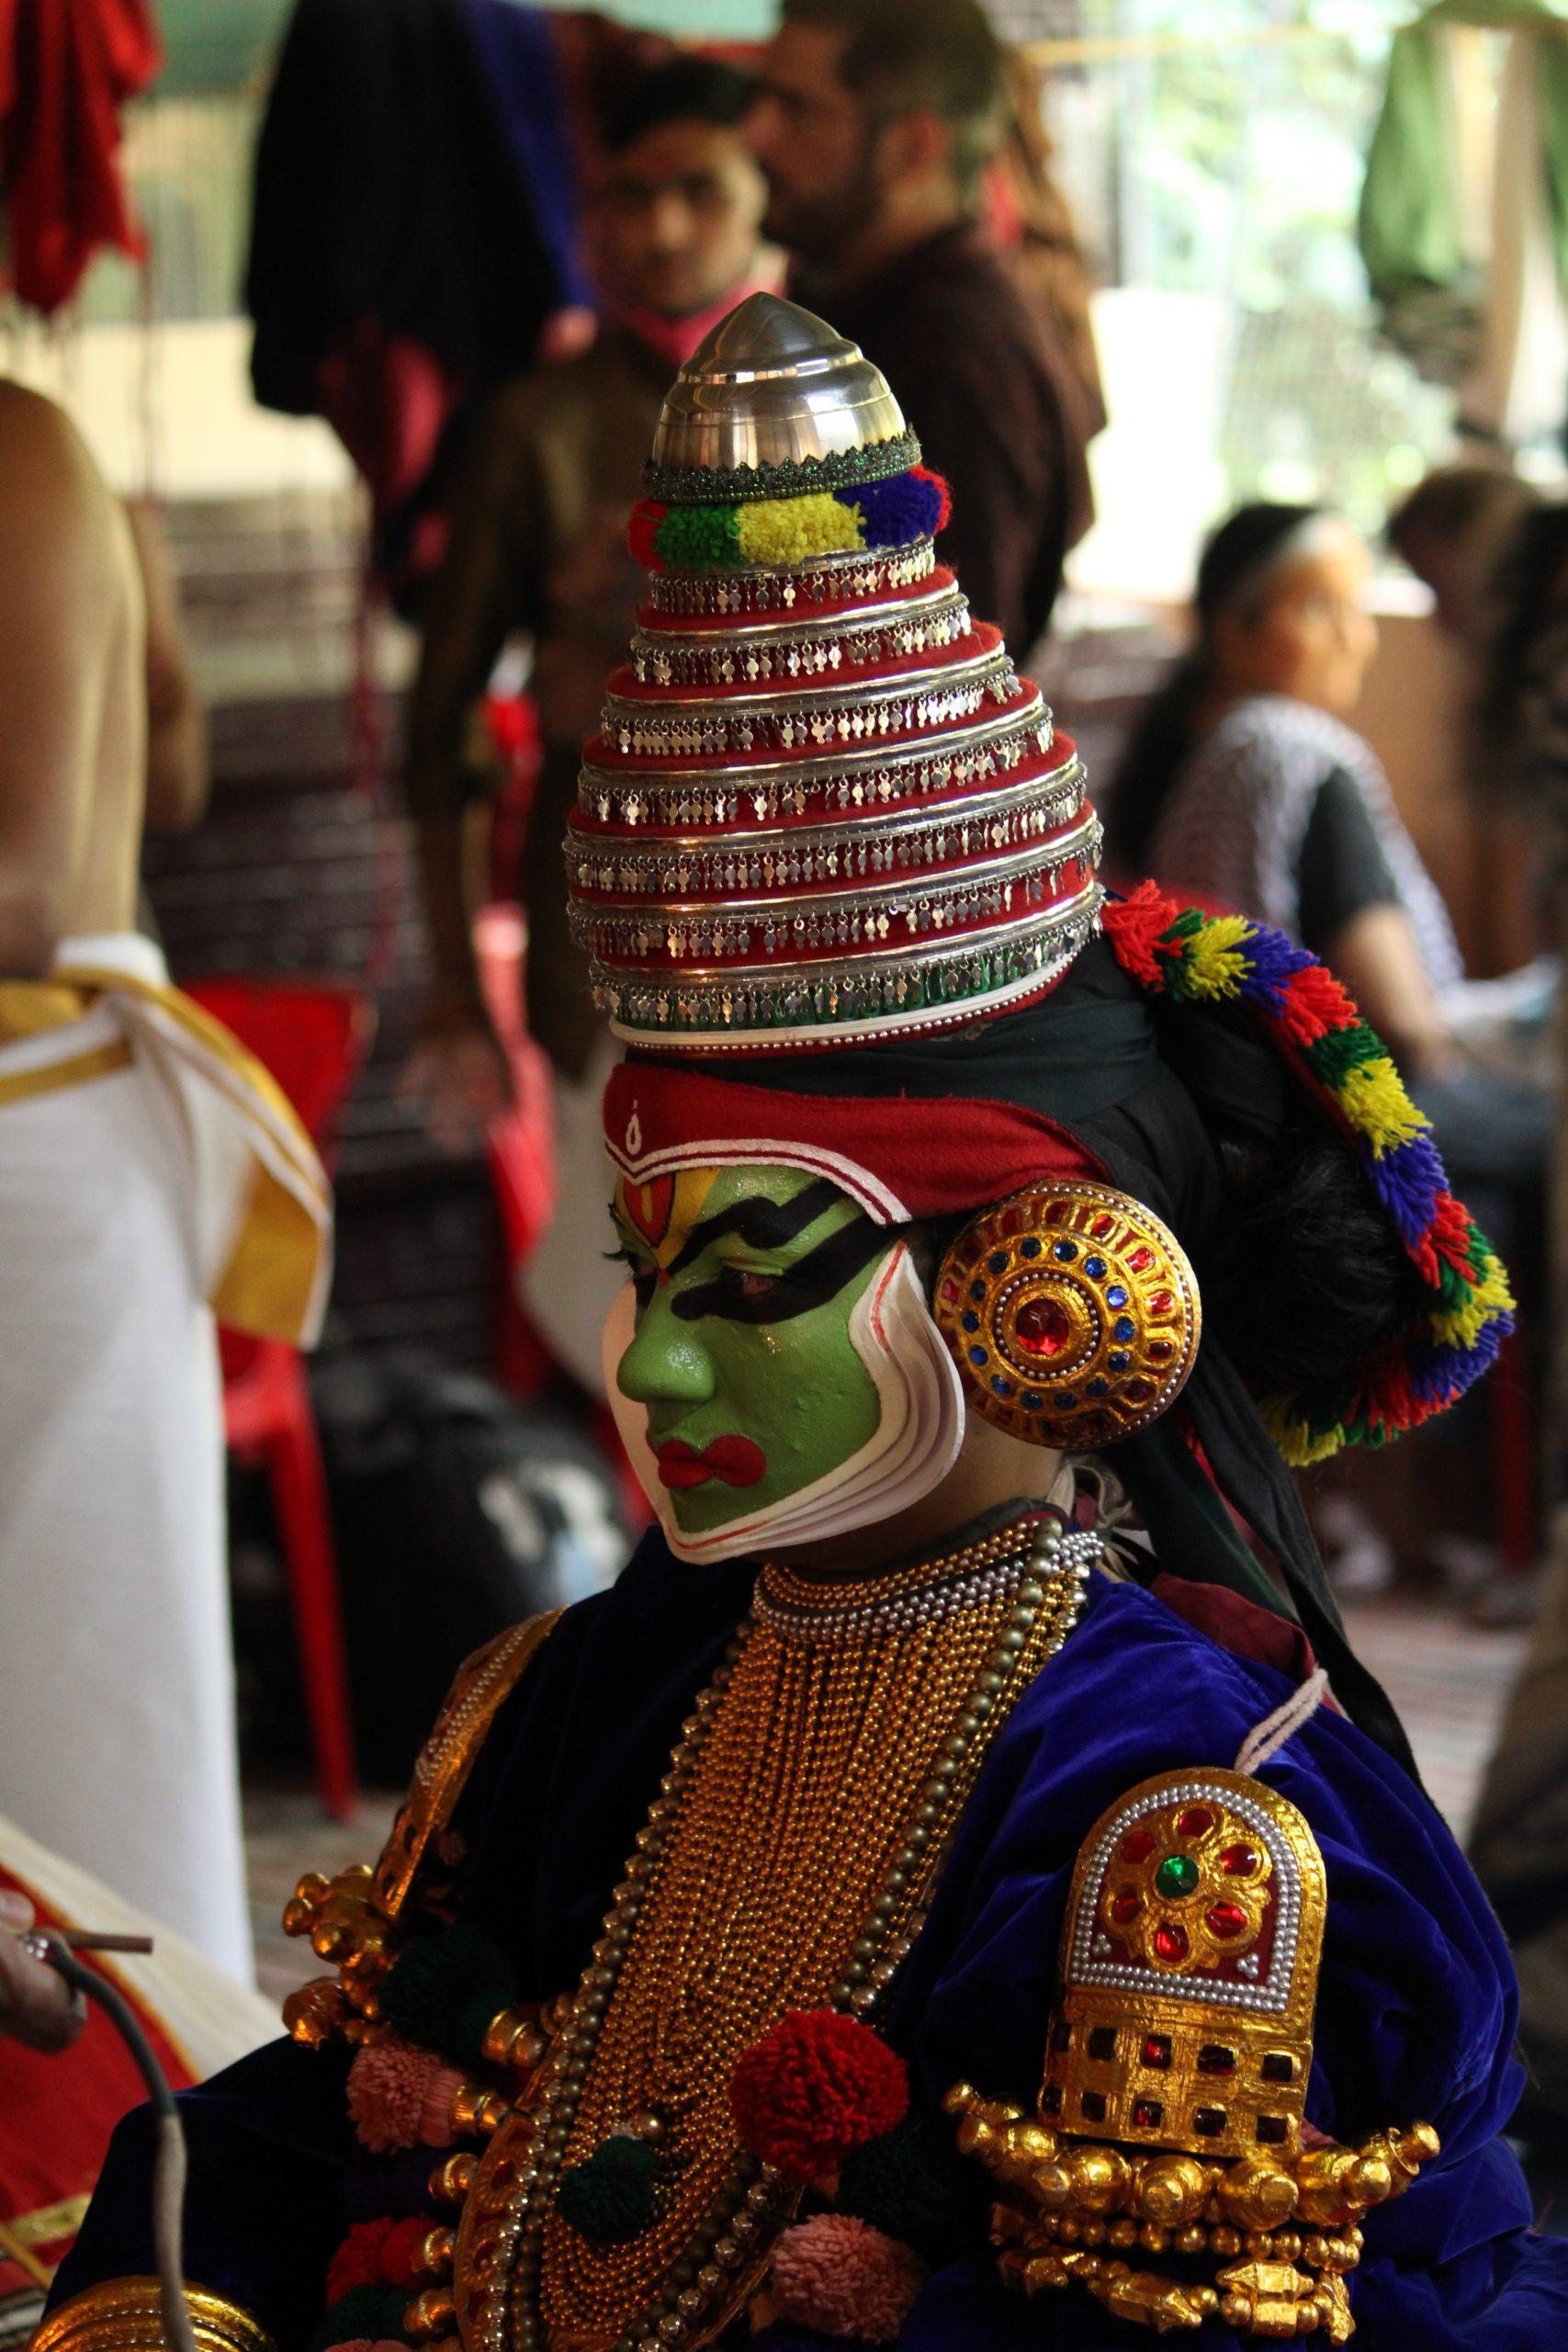 A kathakali dance artist